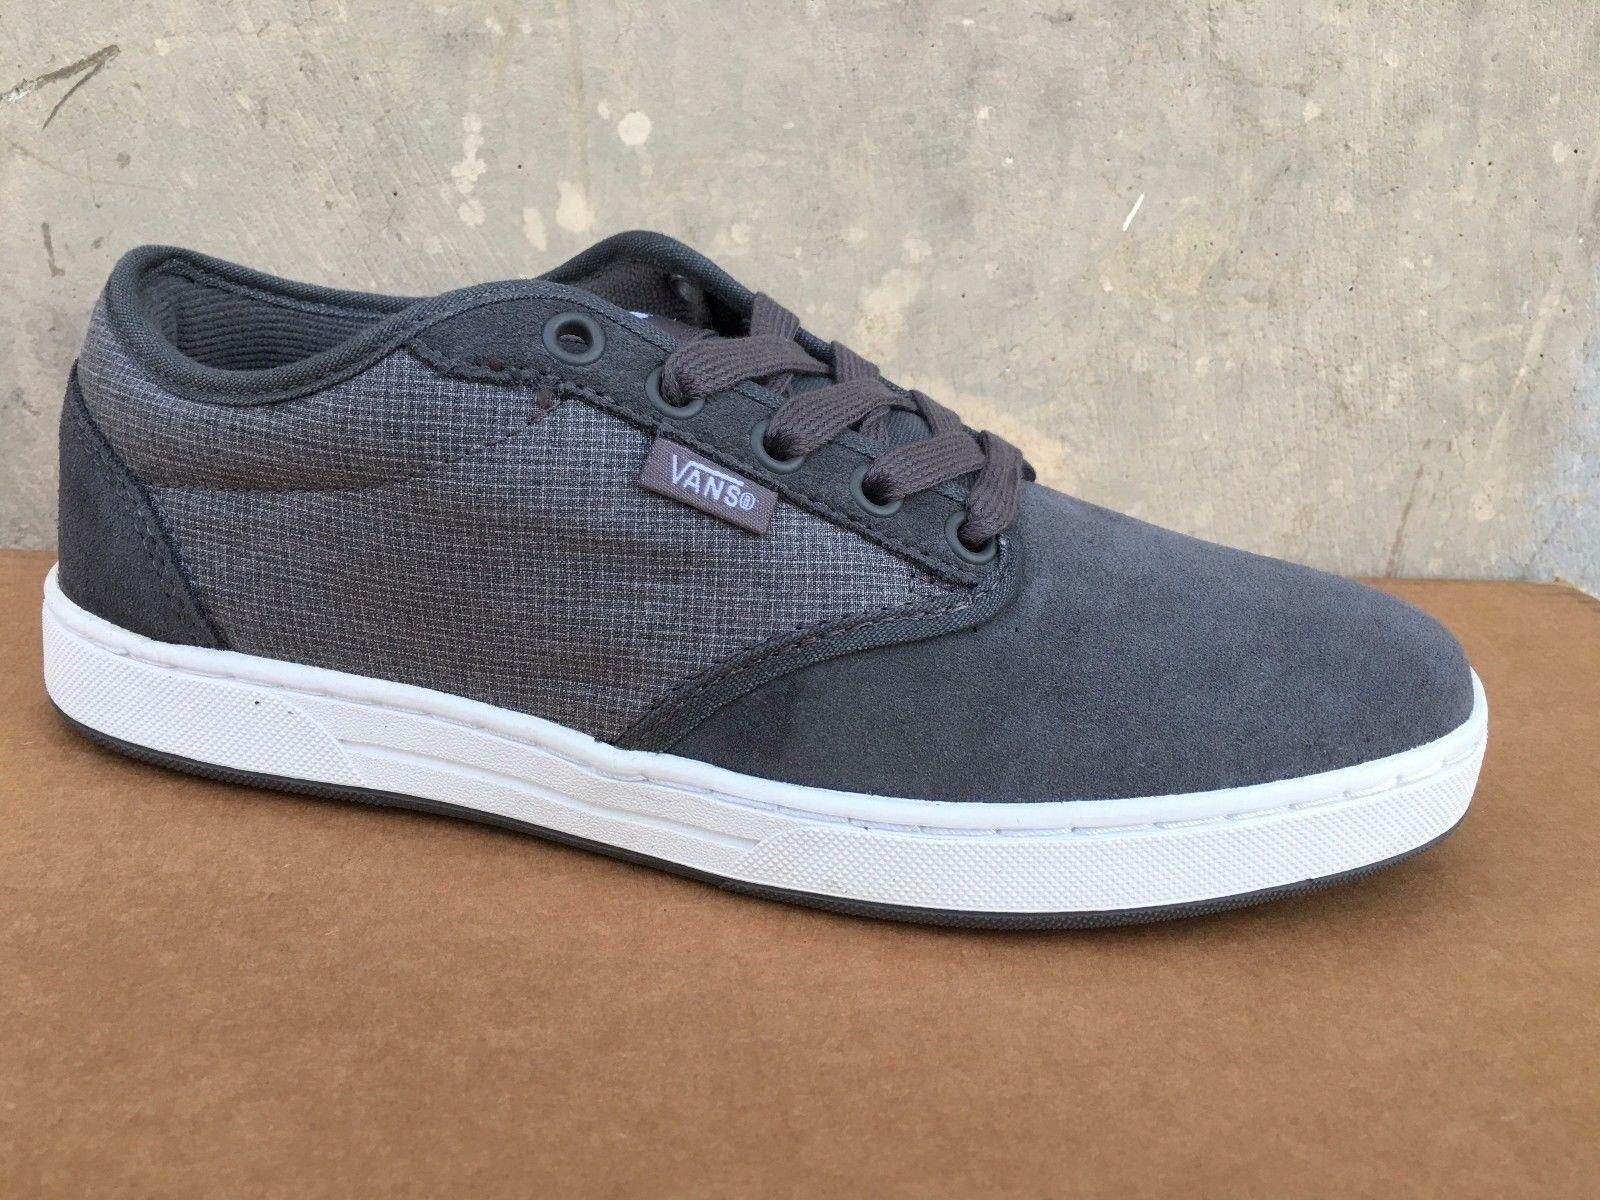 VANS Preston Grey White Casual shoes MEN'S 6.5 WOMEN'S 8